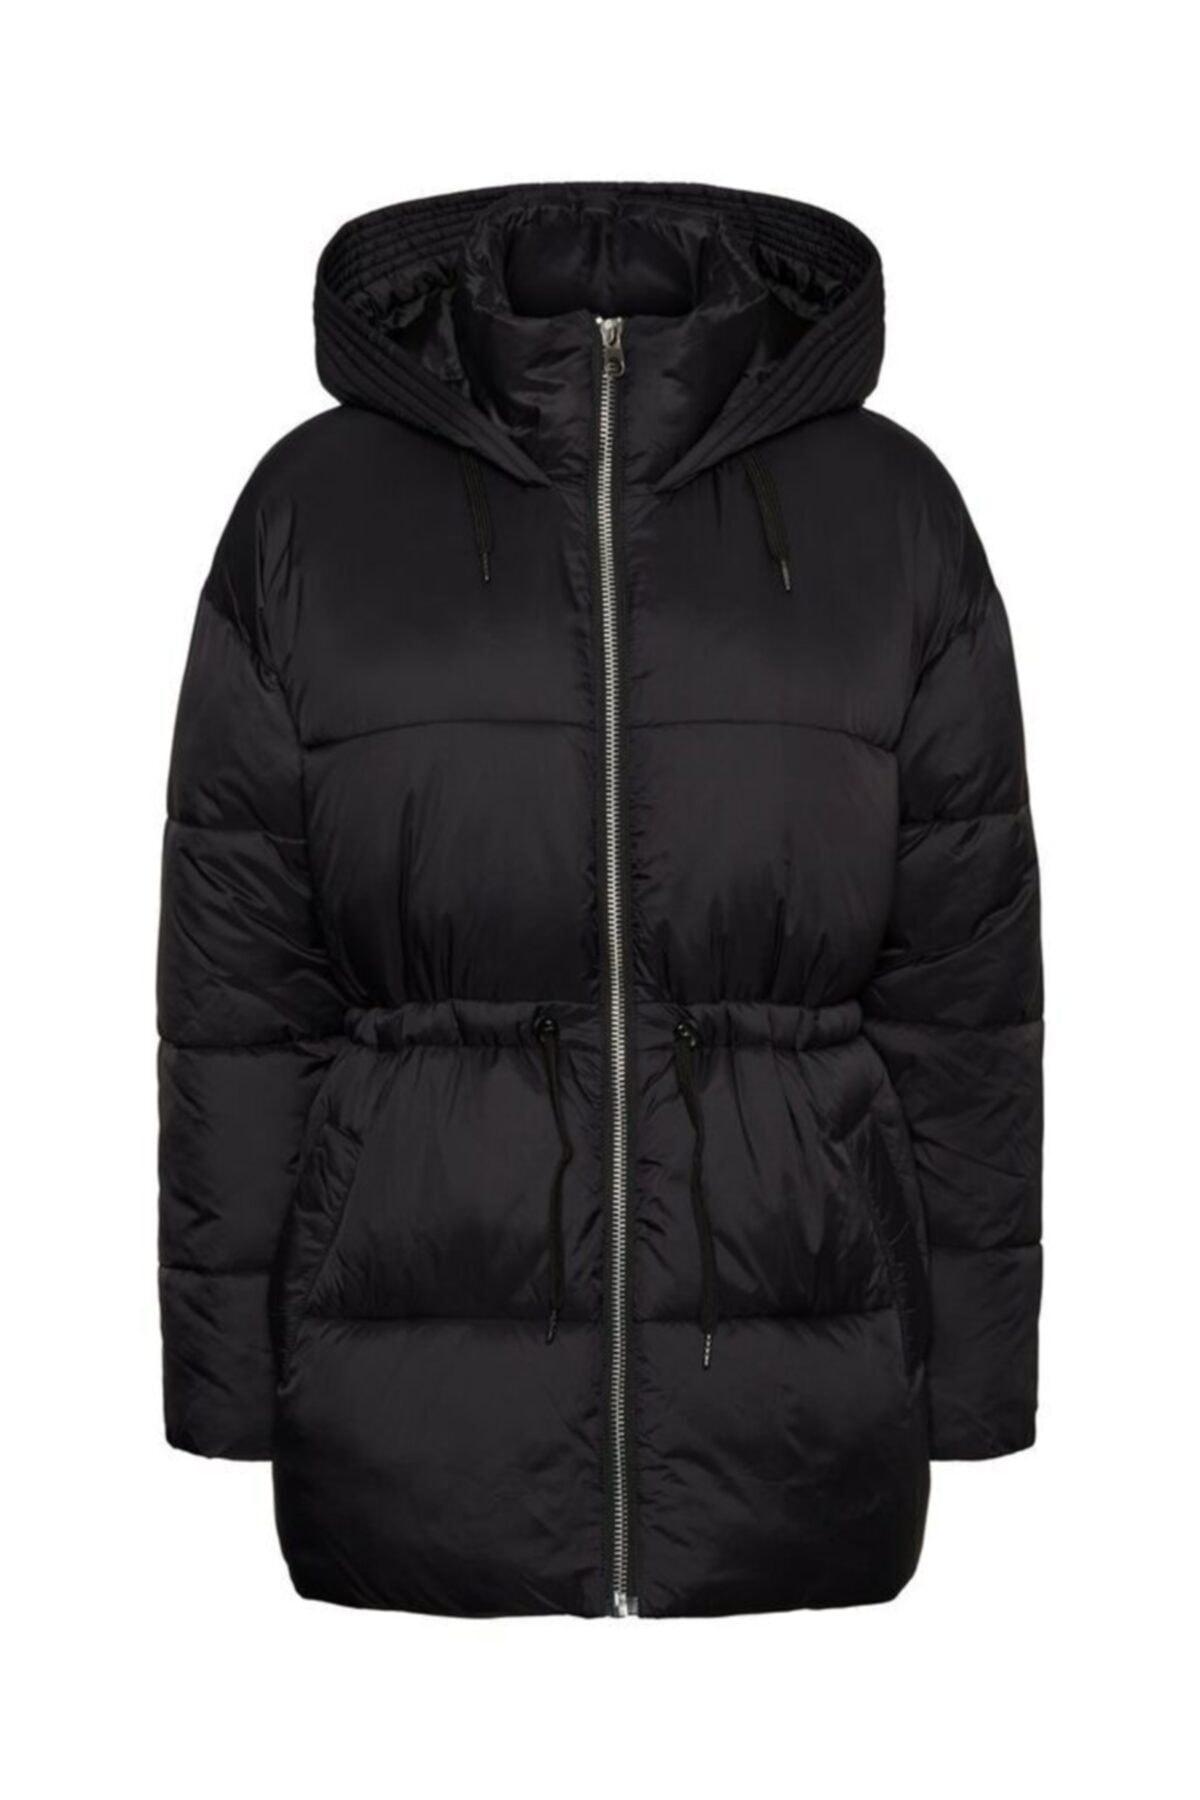 Vero Moda Kadın Siyah Vmsoho Jacket Mont 2